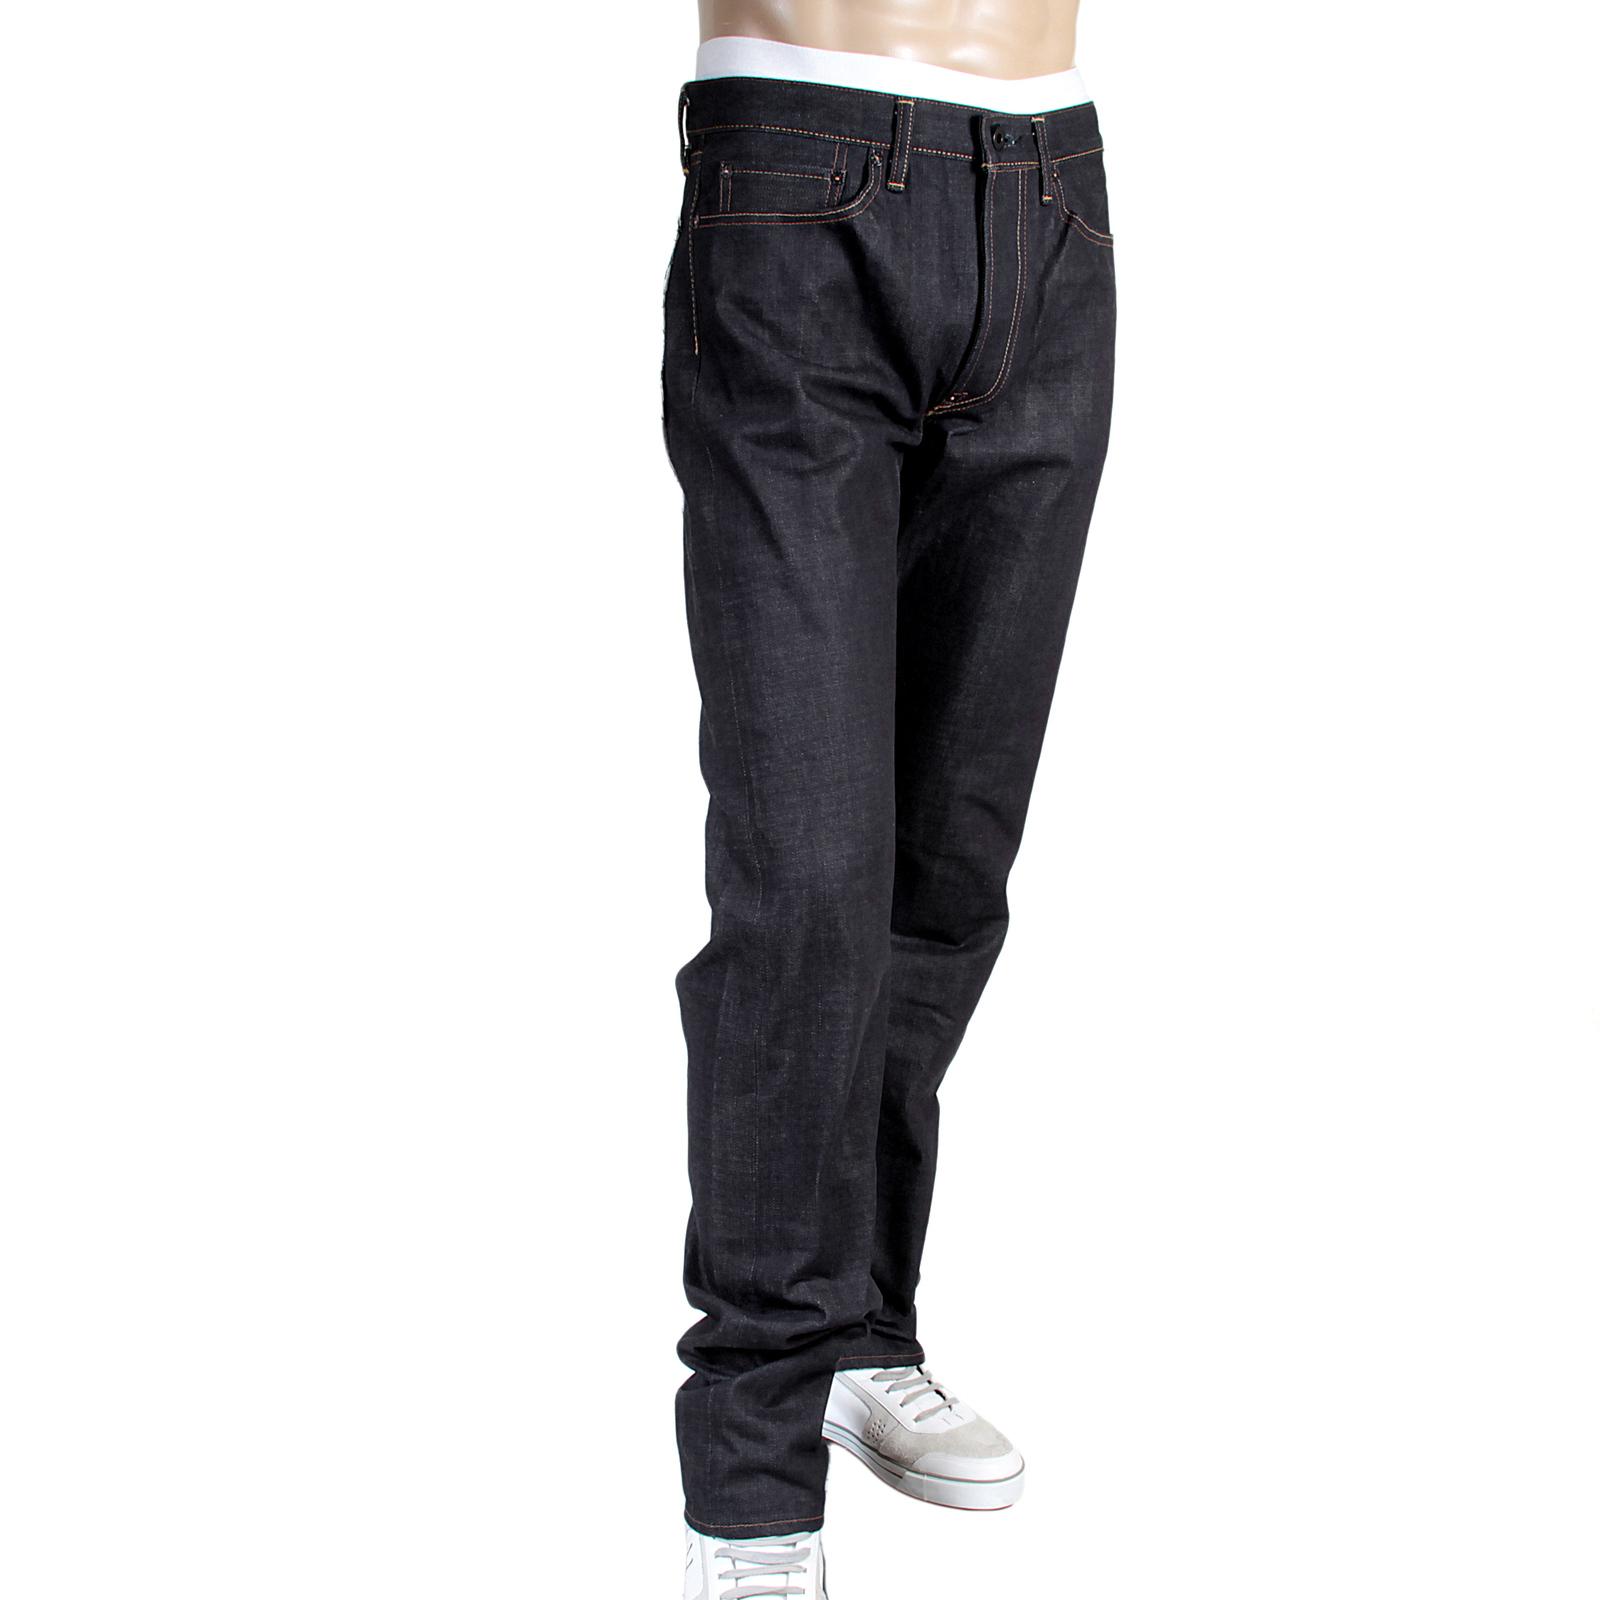 Embroidered Indigo Slim Fit Raw Selvedge Denim Jeans